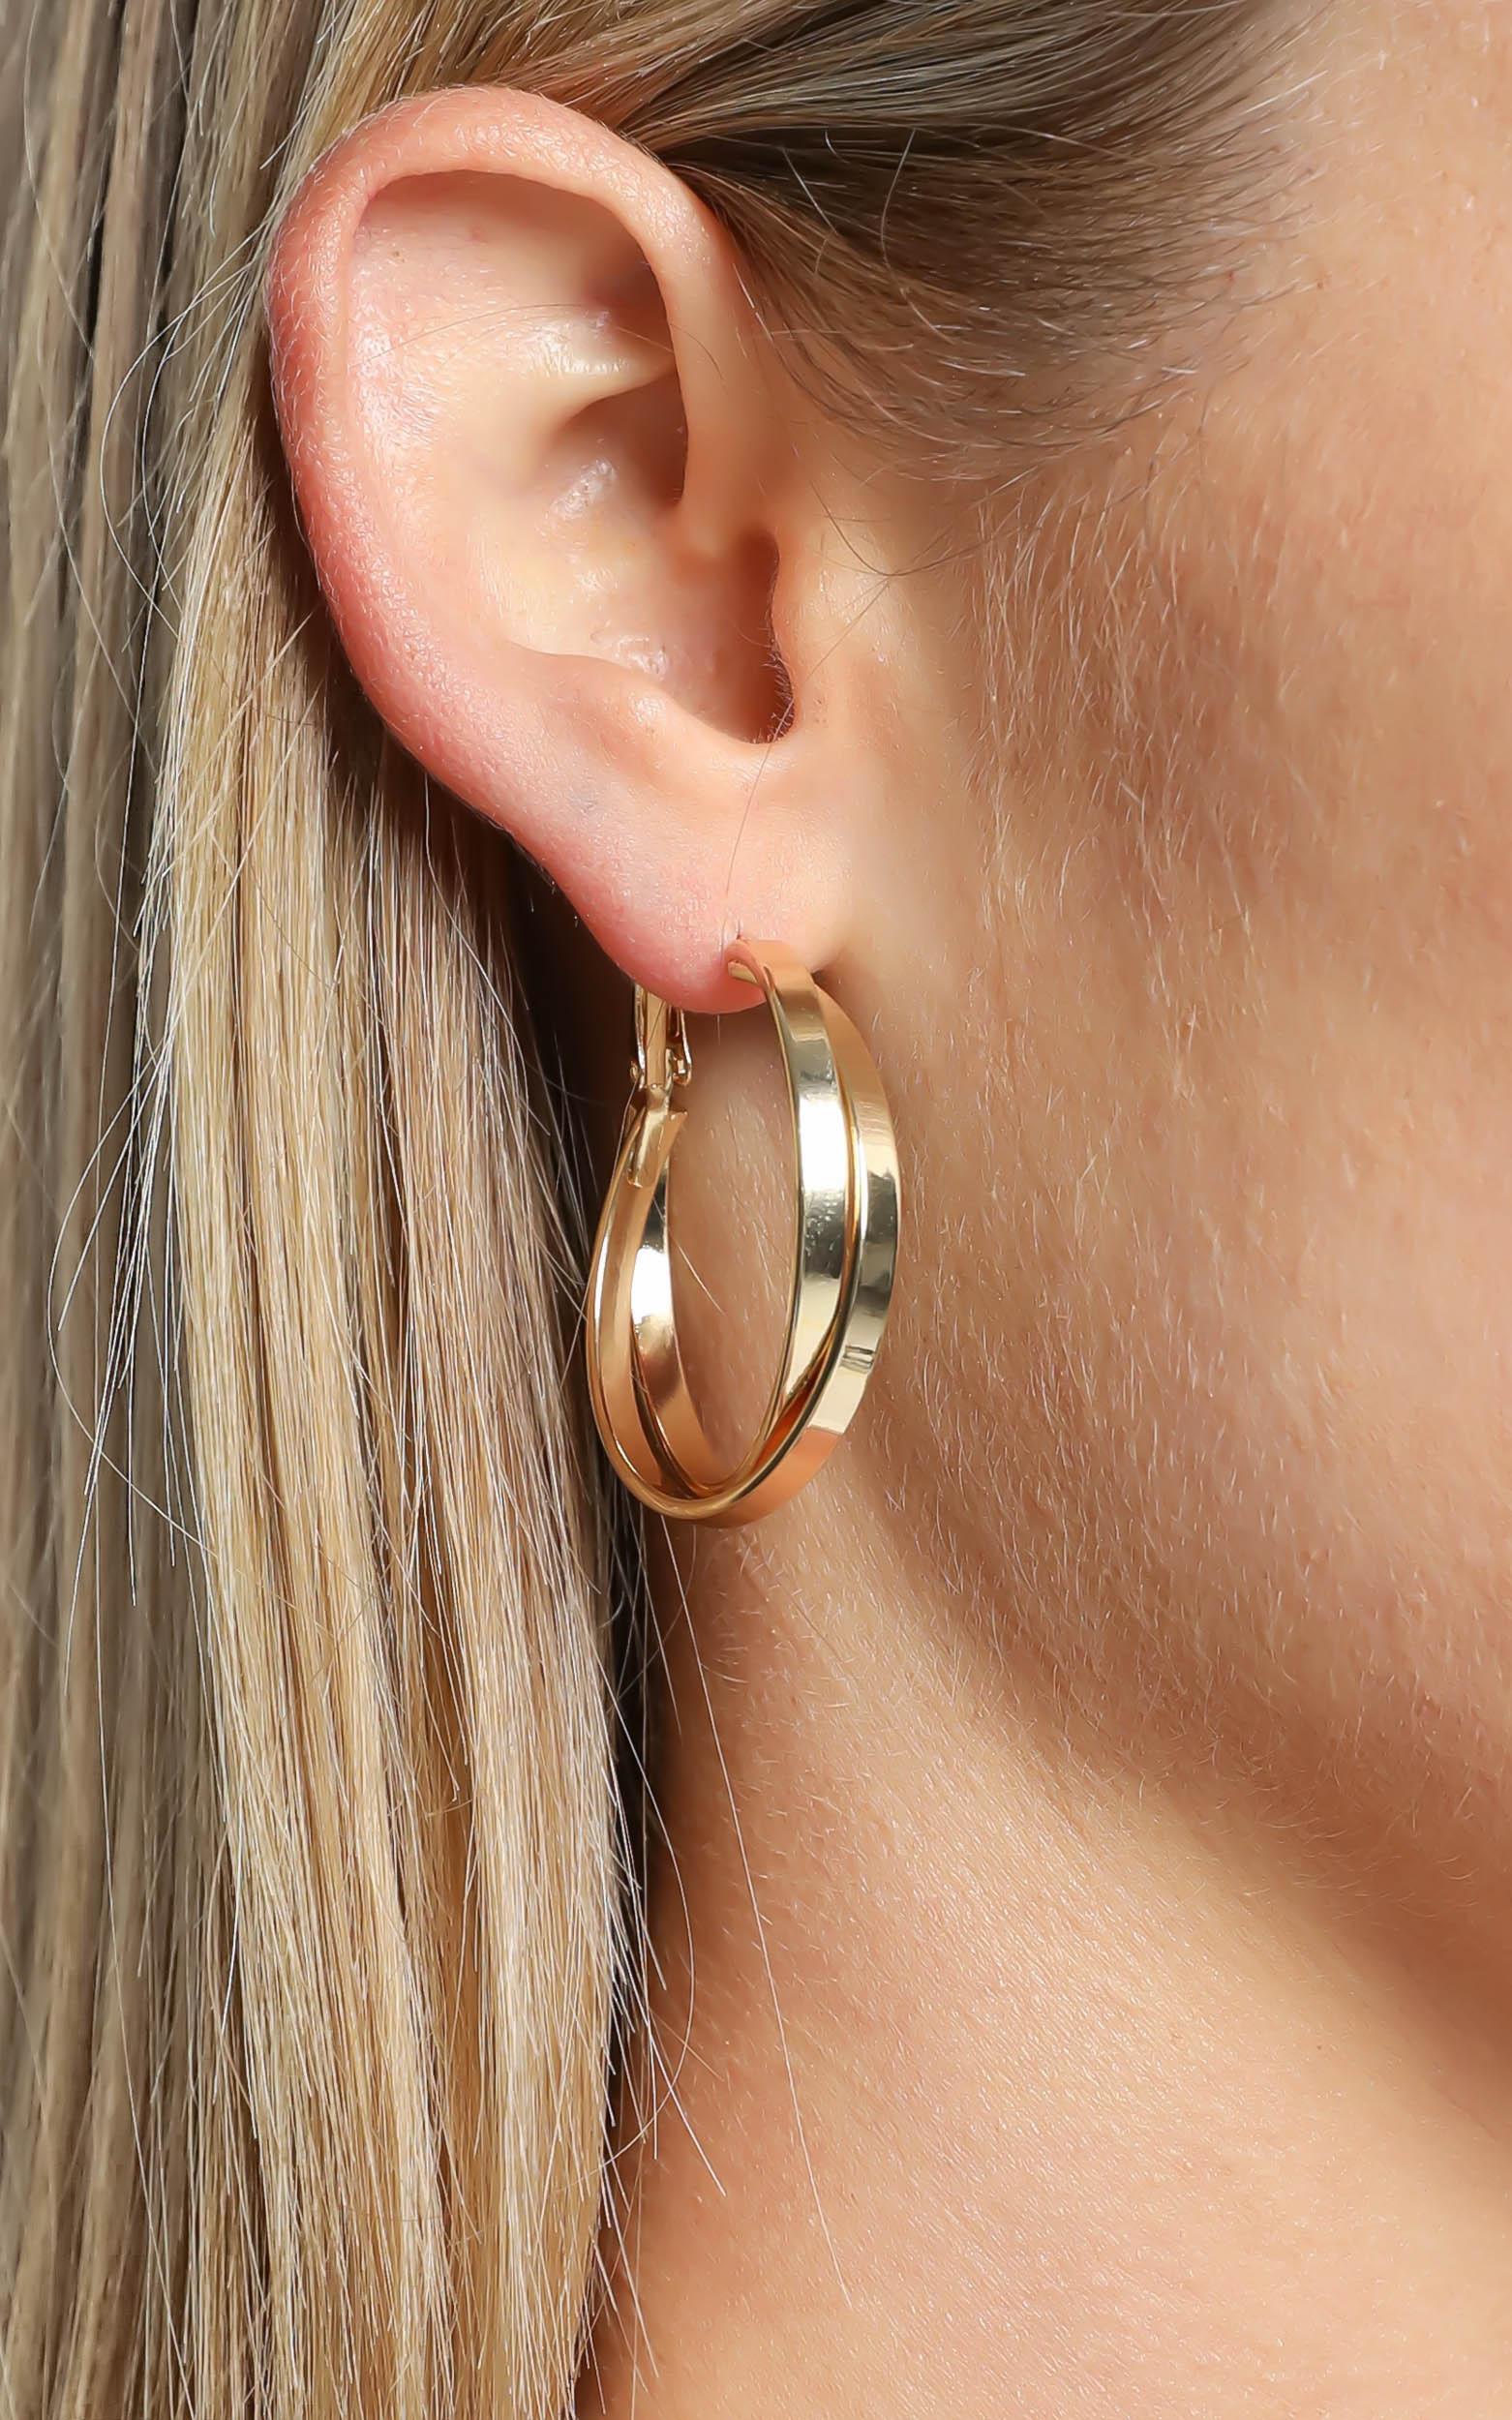 Blakely Earrings in Gold, , hi-res image number null